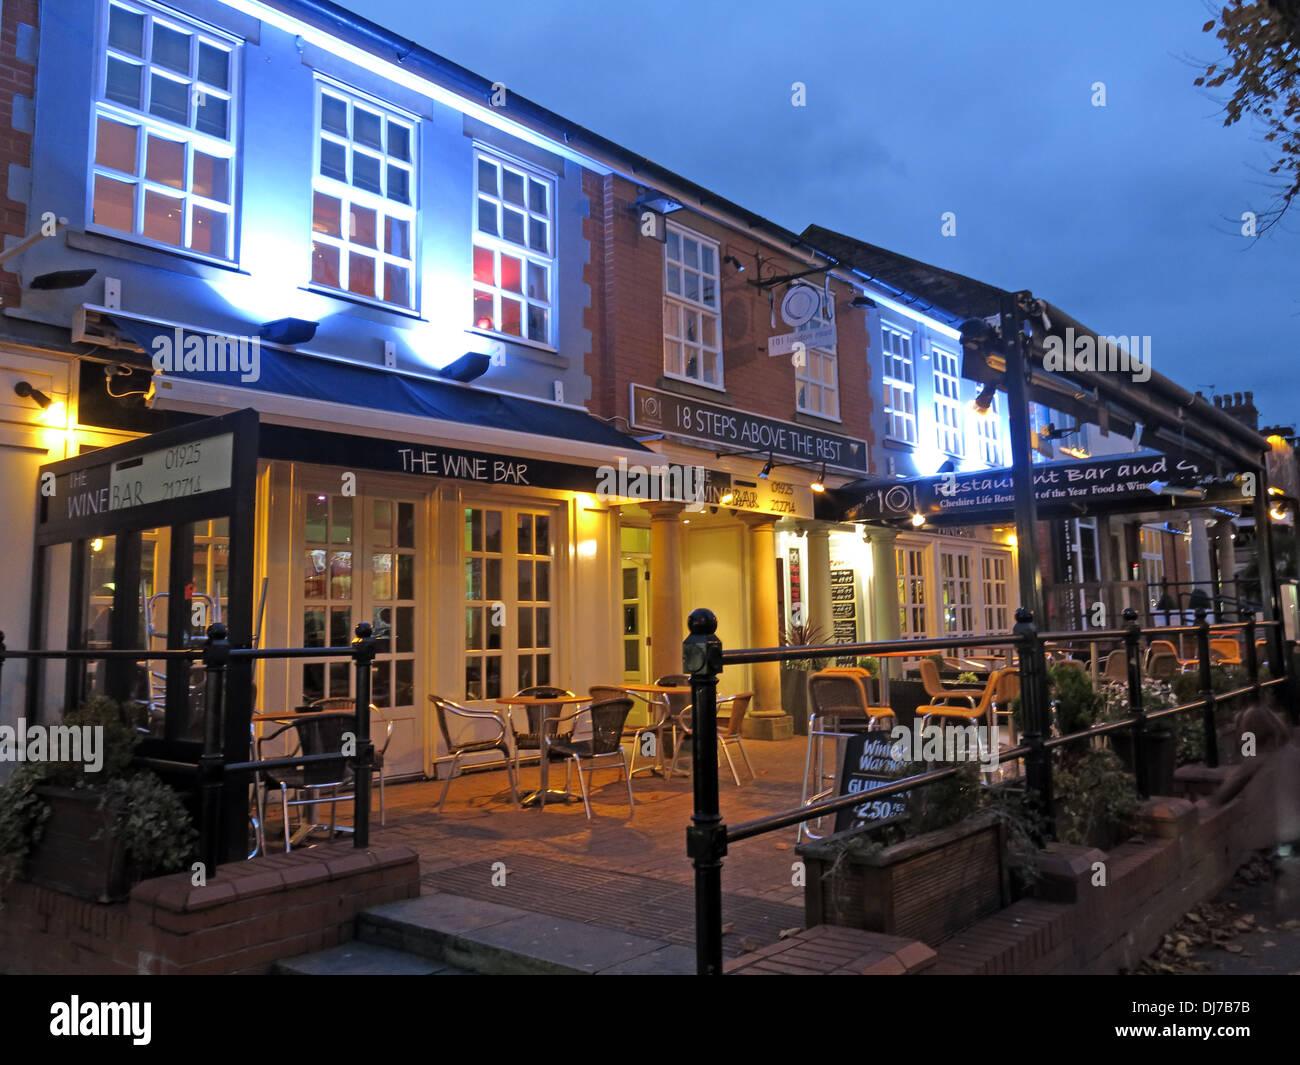 Wine bars Restaurants Stockton Heath Warrington at dusk England UK - Stock Image